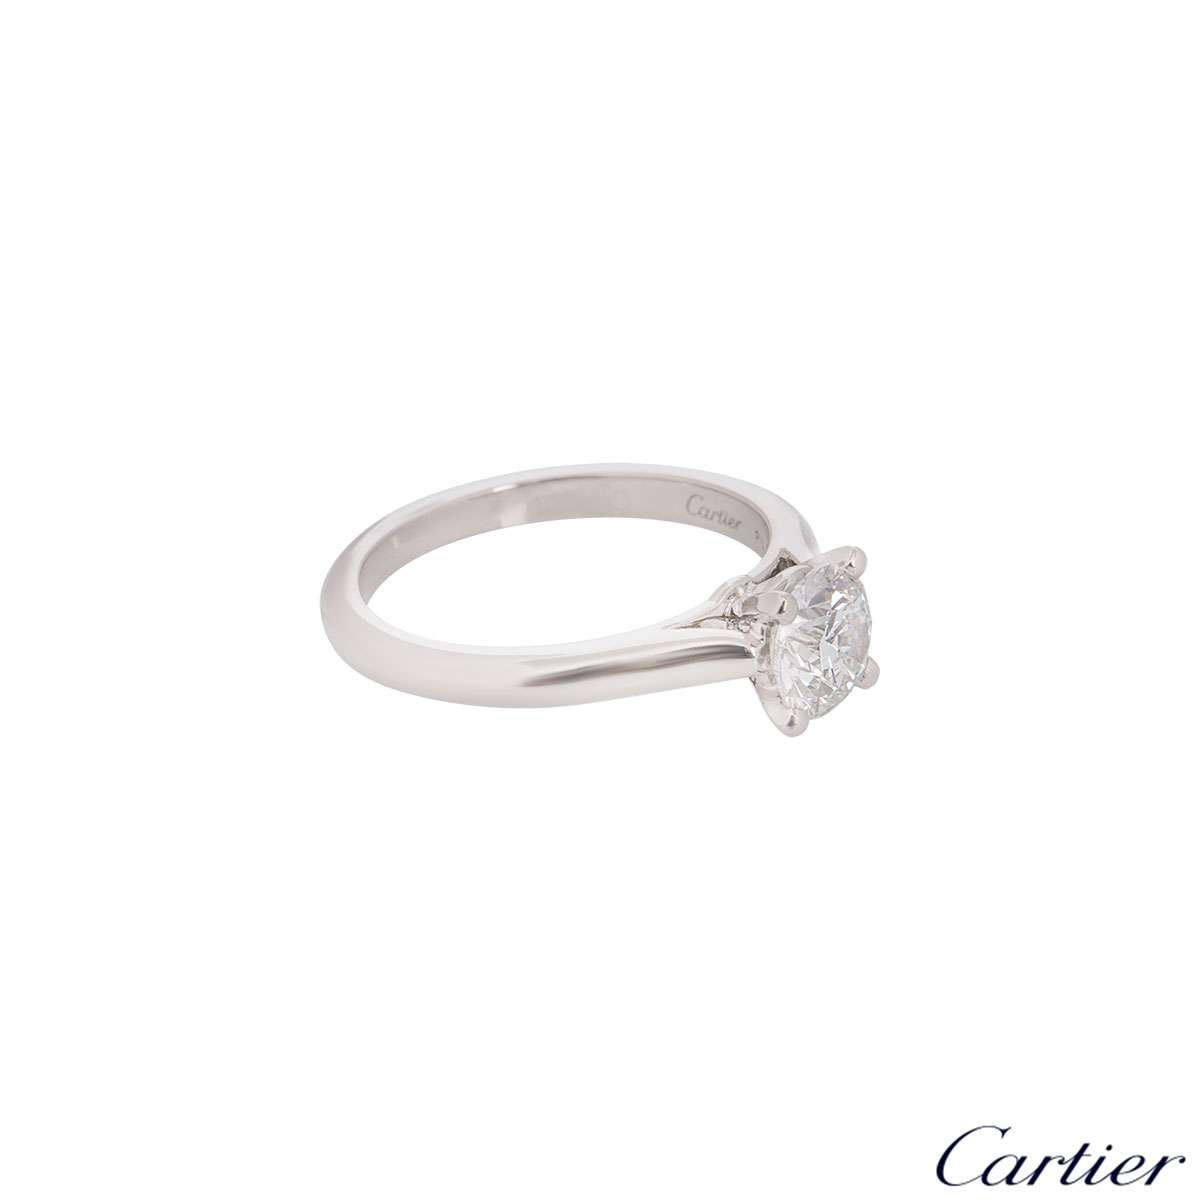 Cartier 1895 Platinum Diamond Ring 1.10ct F/VS1 XXX N4162955